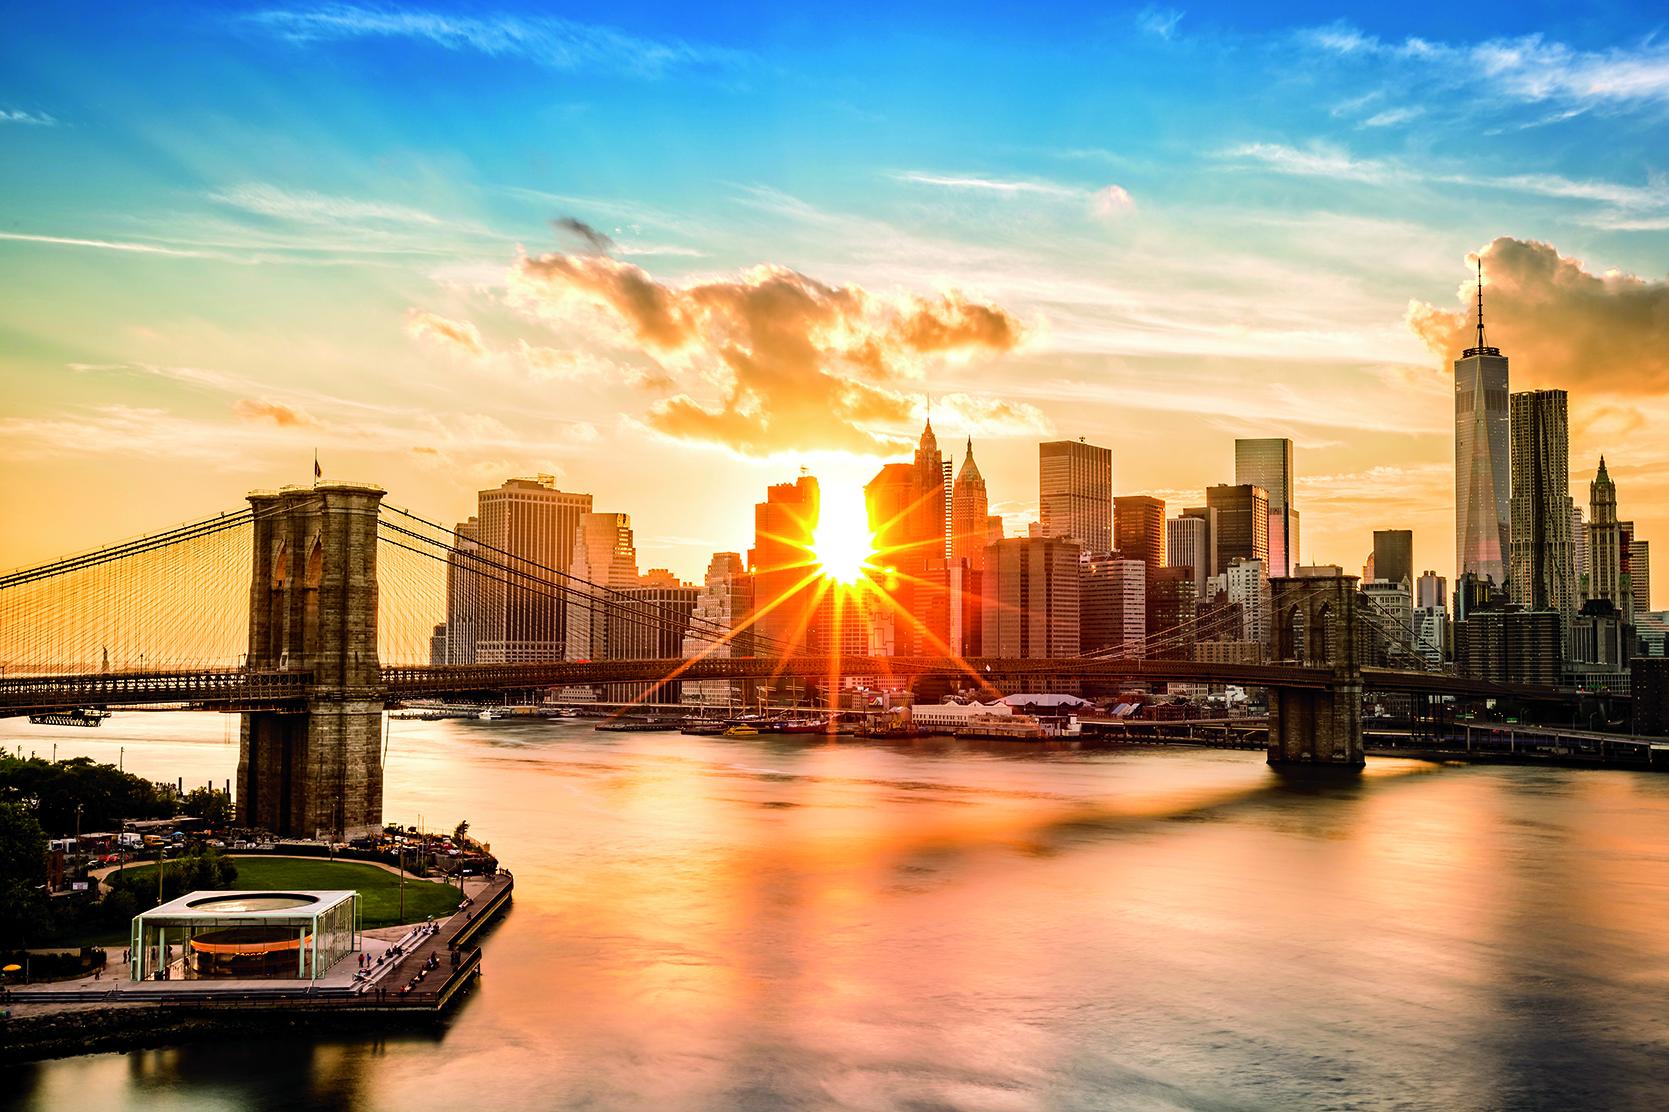 Brooklyn Bridge and the Lower Manhattan skyline at sunset, as viewed from Manhattan Bridge